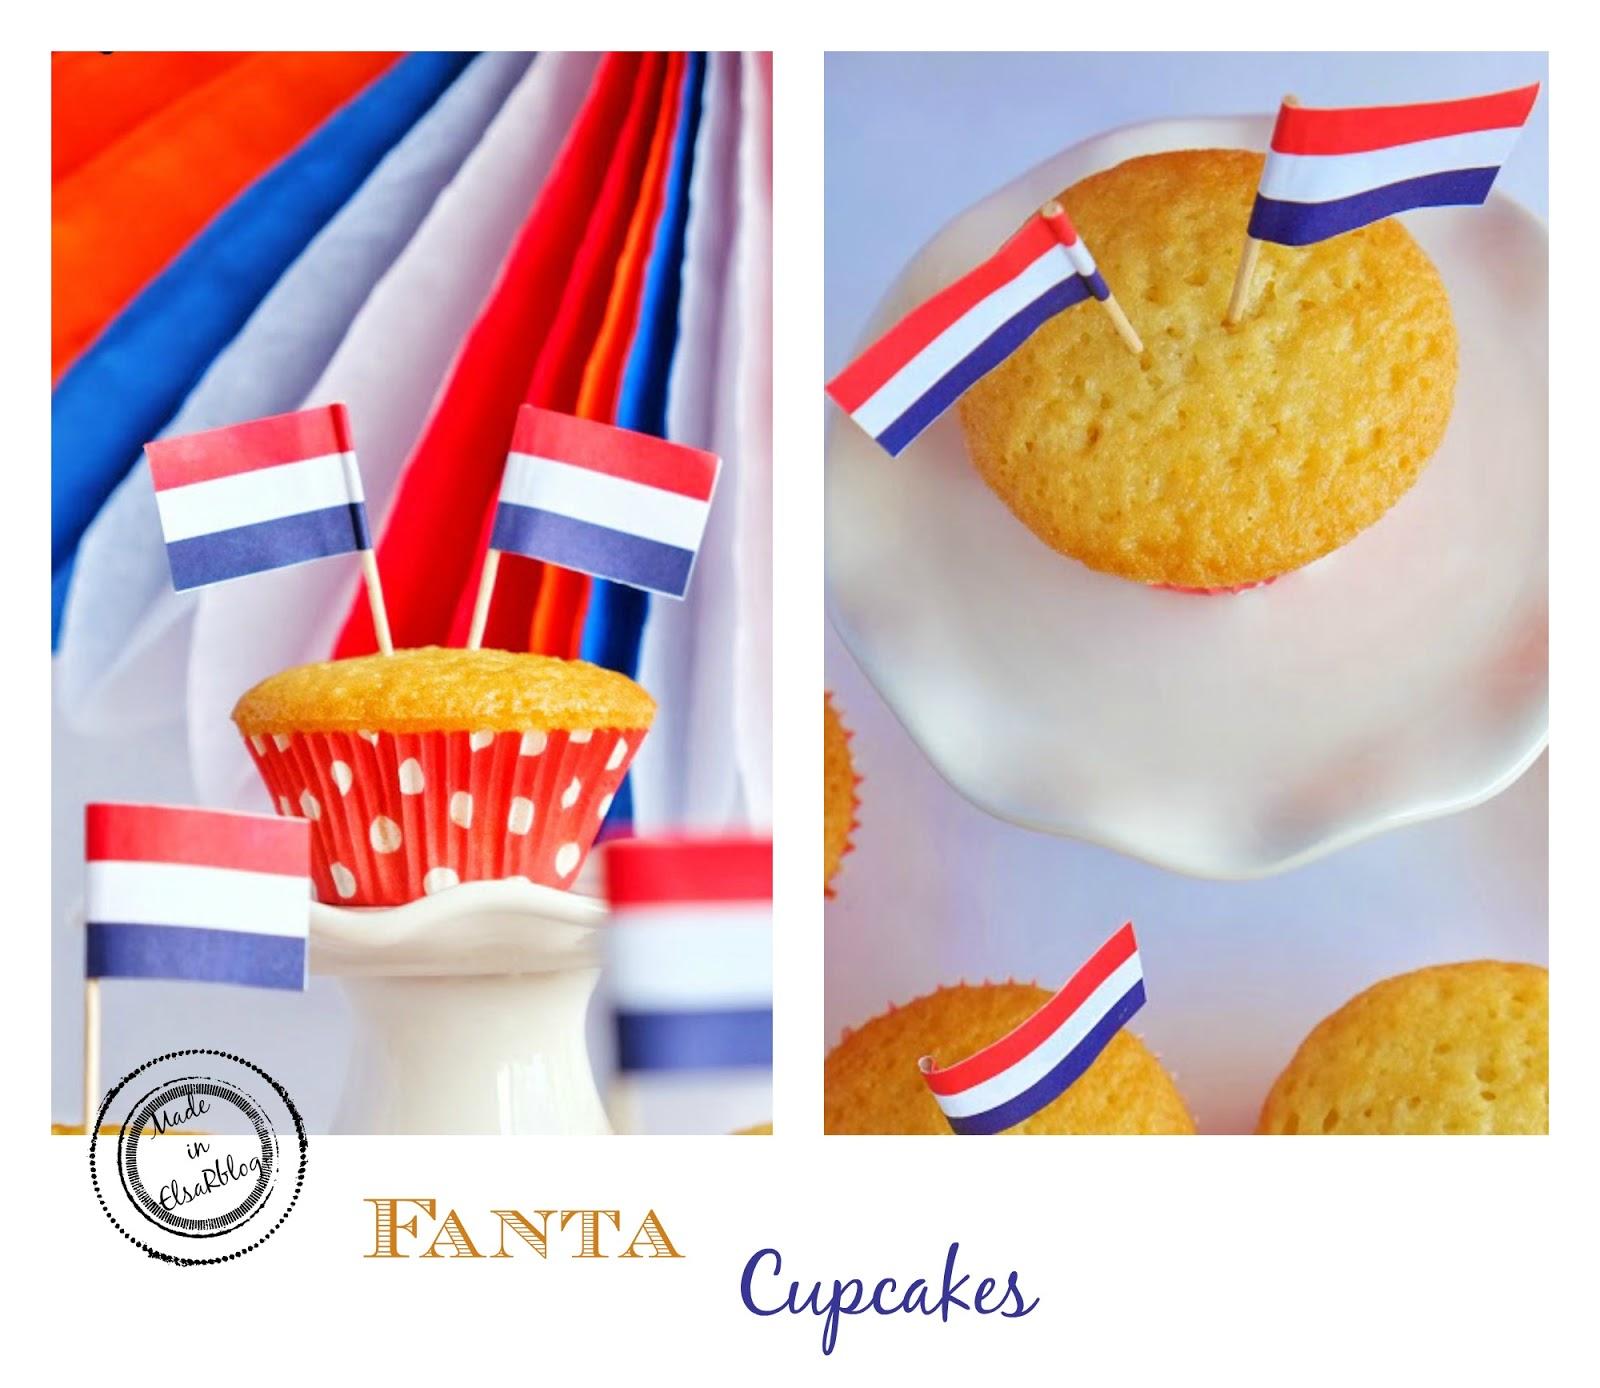 Fanta cupcakes